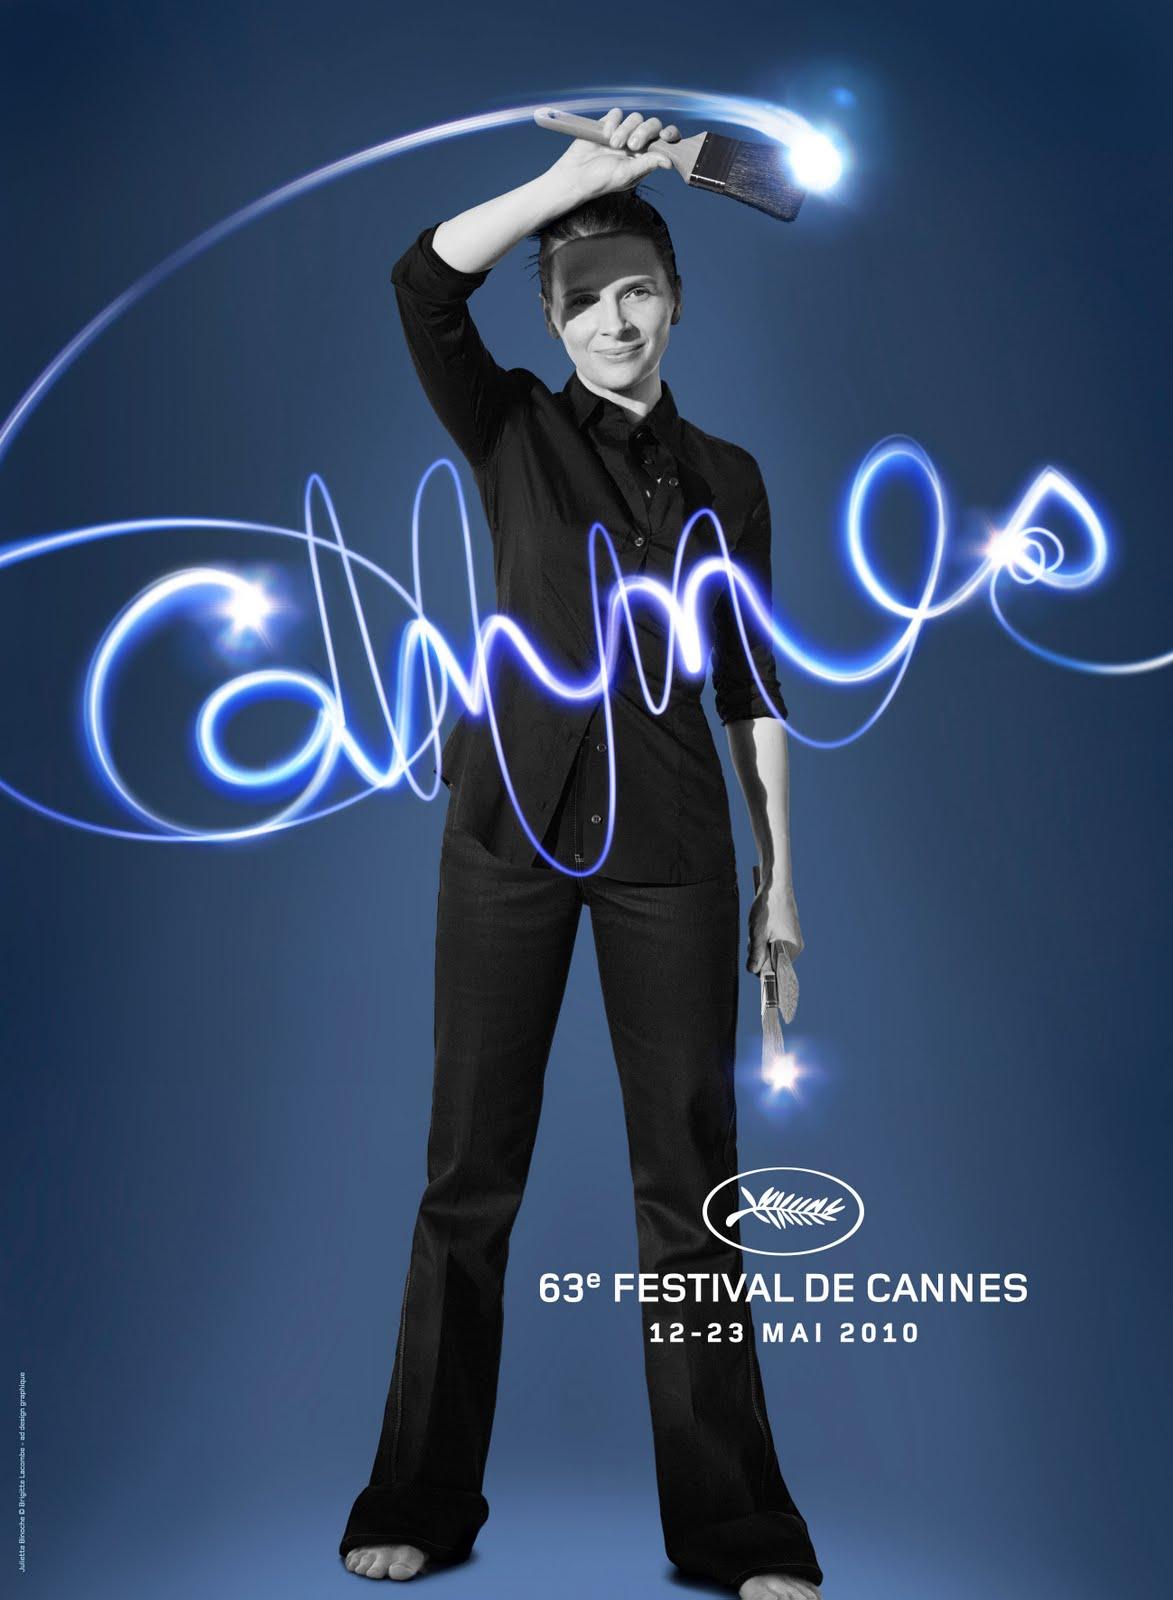 http://3.bp.blogspot.com/_dRxpkiNQHIY/S7DJoDBI2PI/AAAAAAAAFy0/5fZUtstuDRc/s1600/Cannes+Affiche63_30x22.jpg